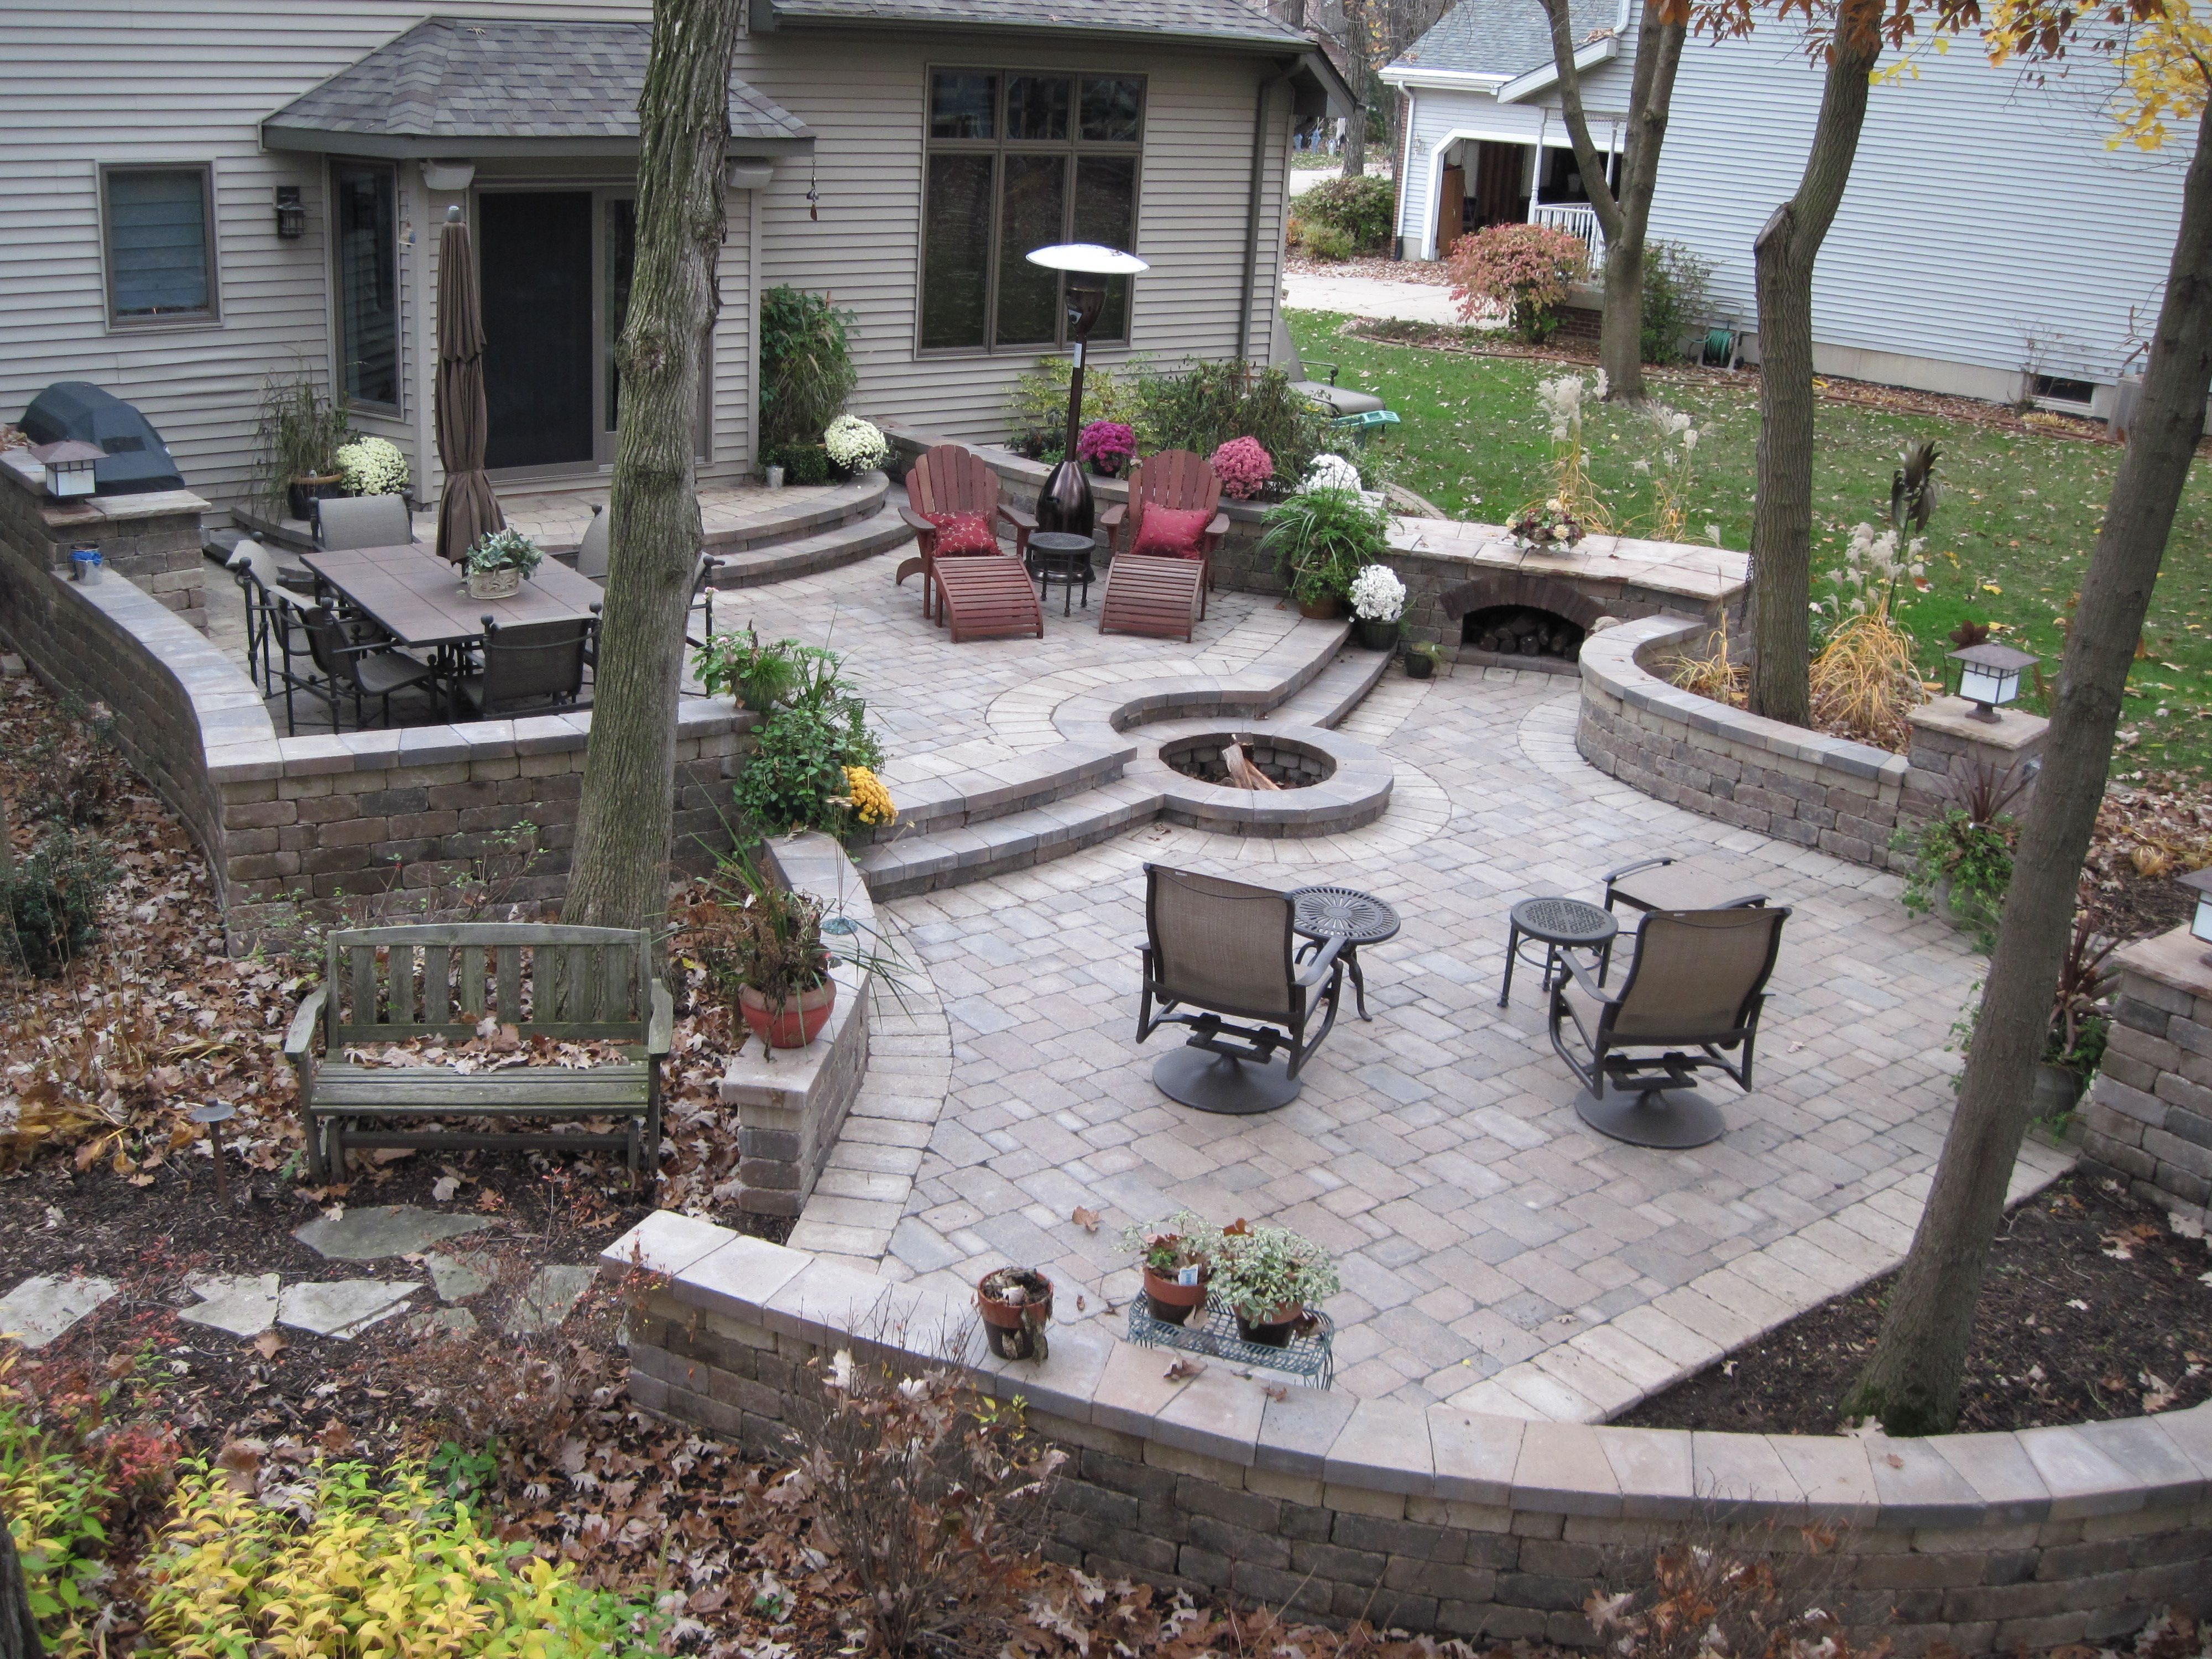 Unilock Patio | Patio, Paver patio, Backyard landscaping ... on Unilock Patio Ideas id=38564